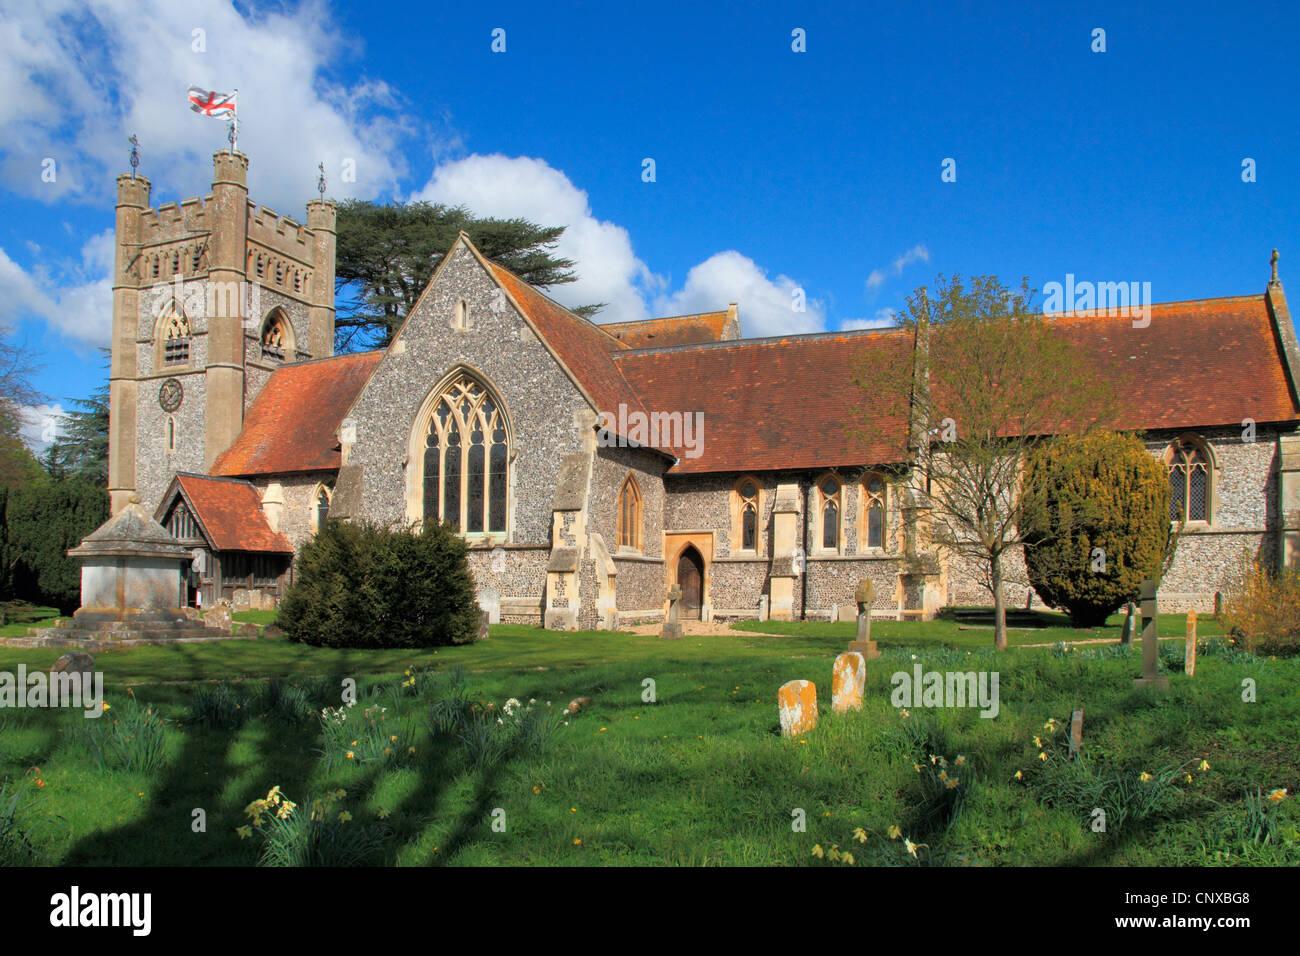 England Buckinghamshire Hambleden church Stock Photo